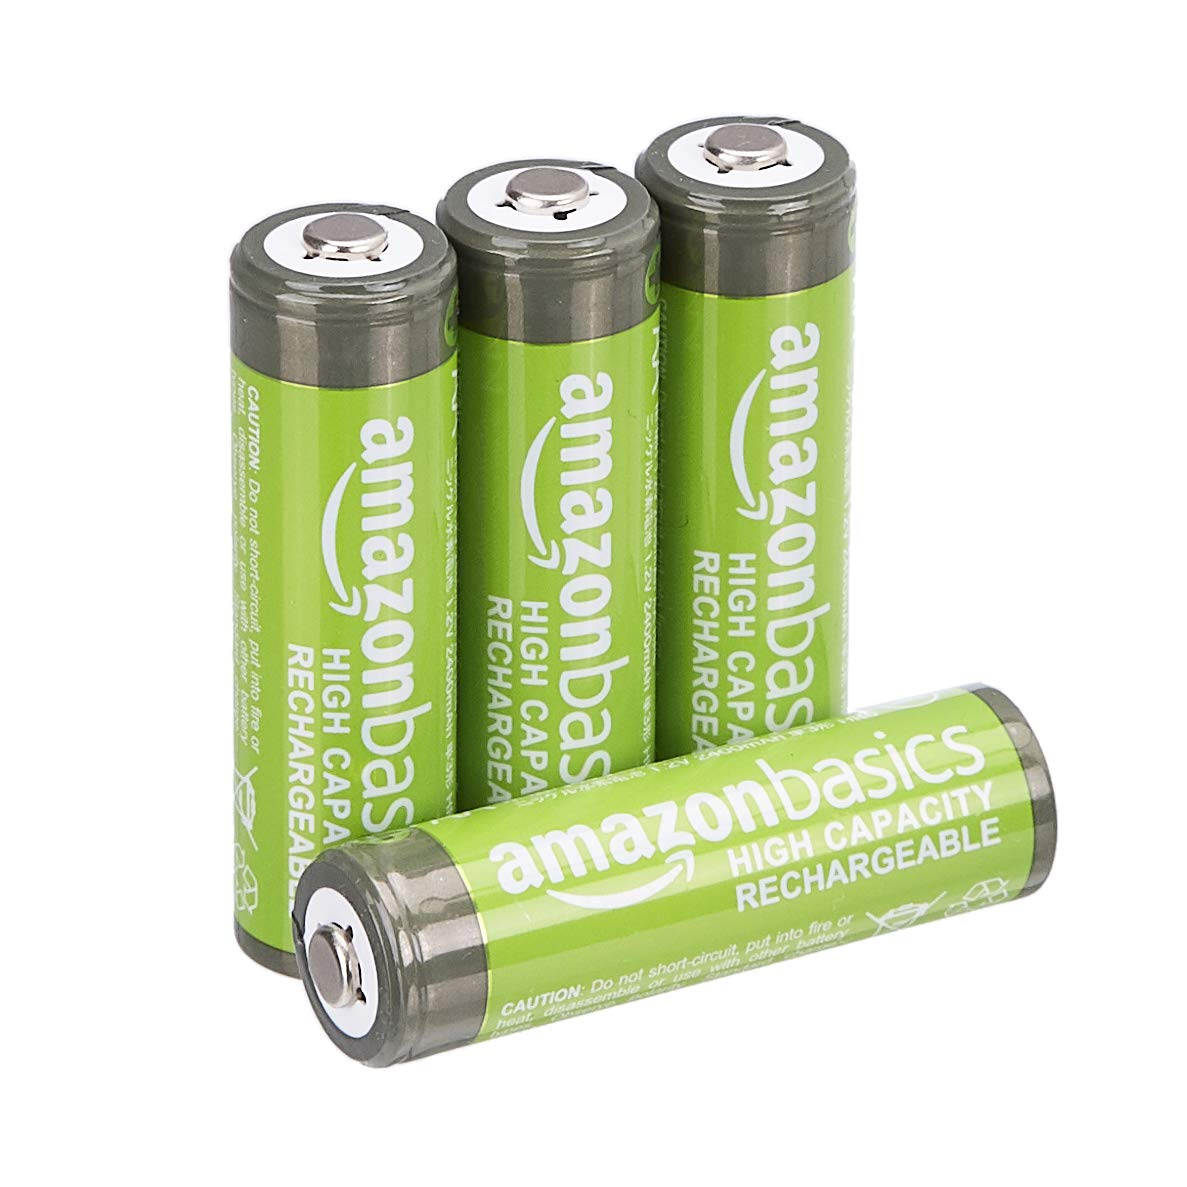 AmazonBasics AA High-Capacity Rechargeable